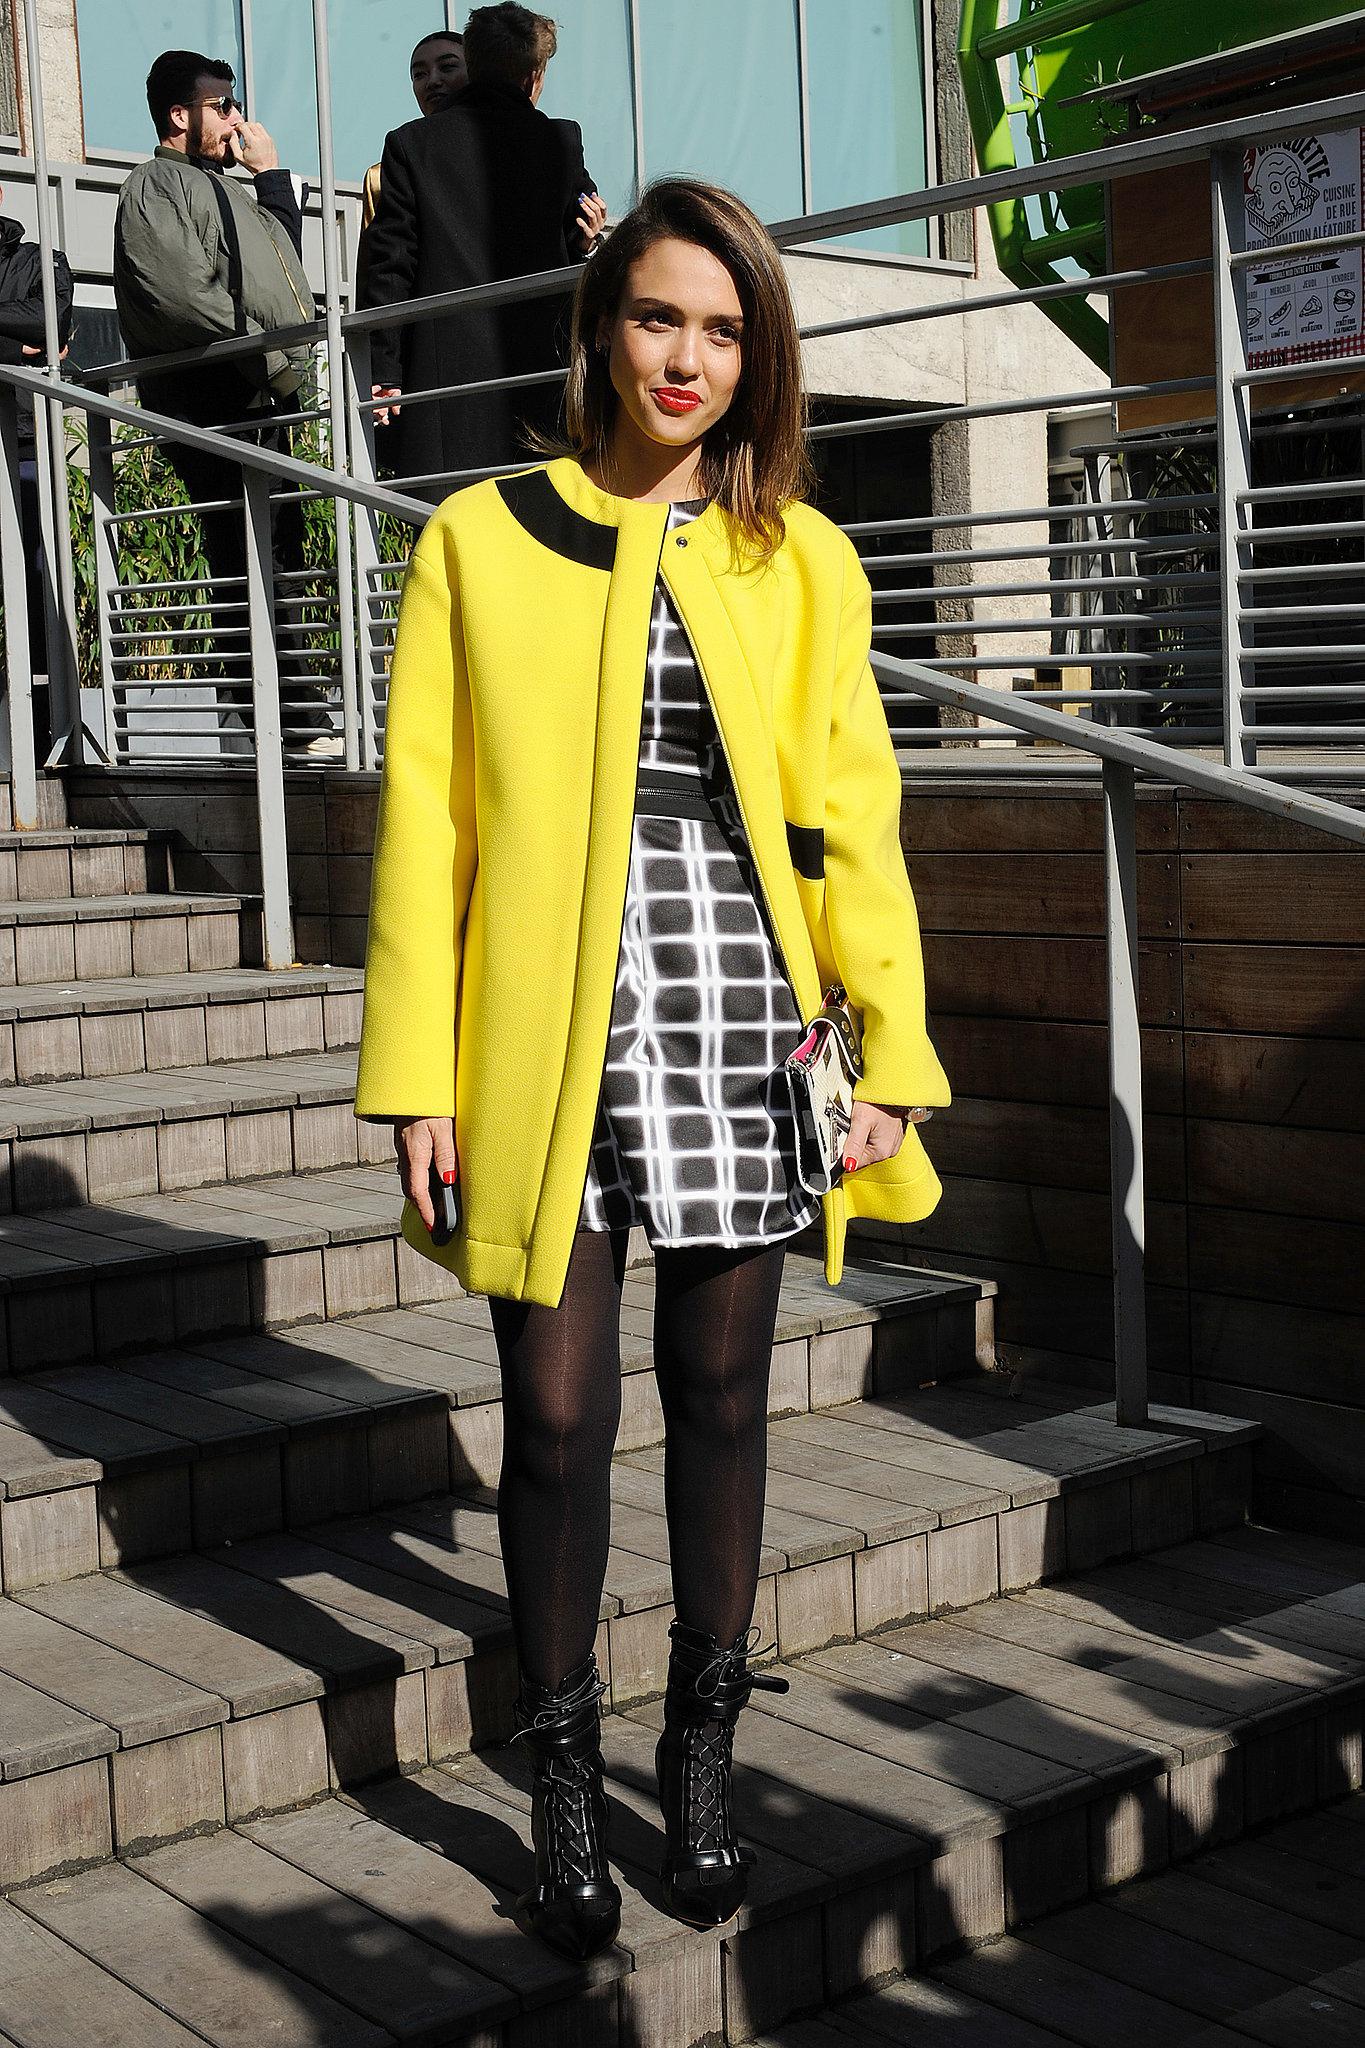 Jessica Alba in Printed Kenzo Dress and Yellow Kenzo Coat